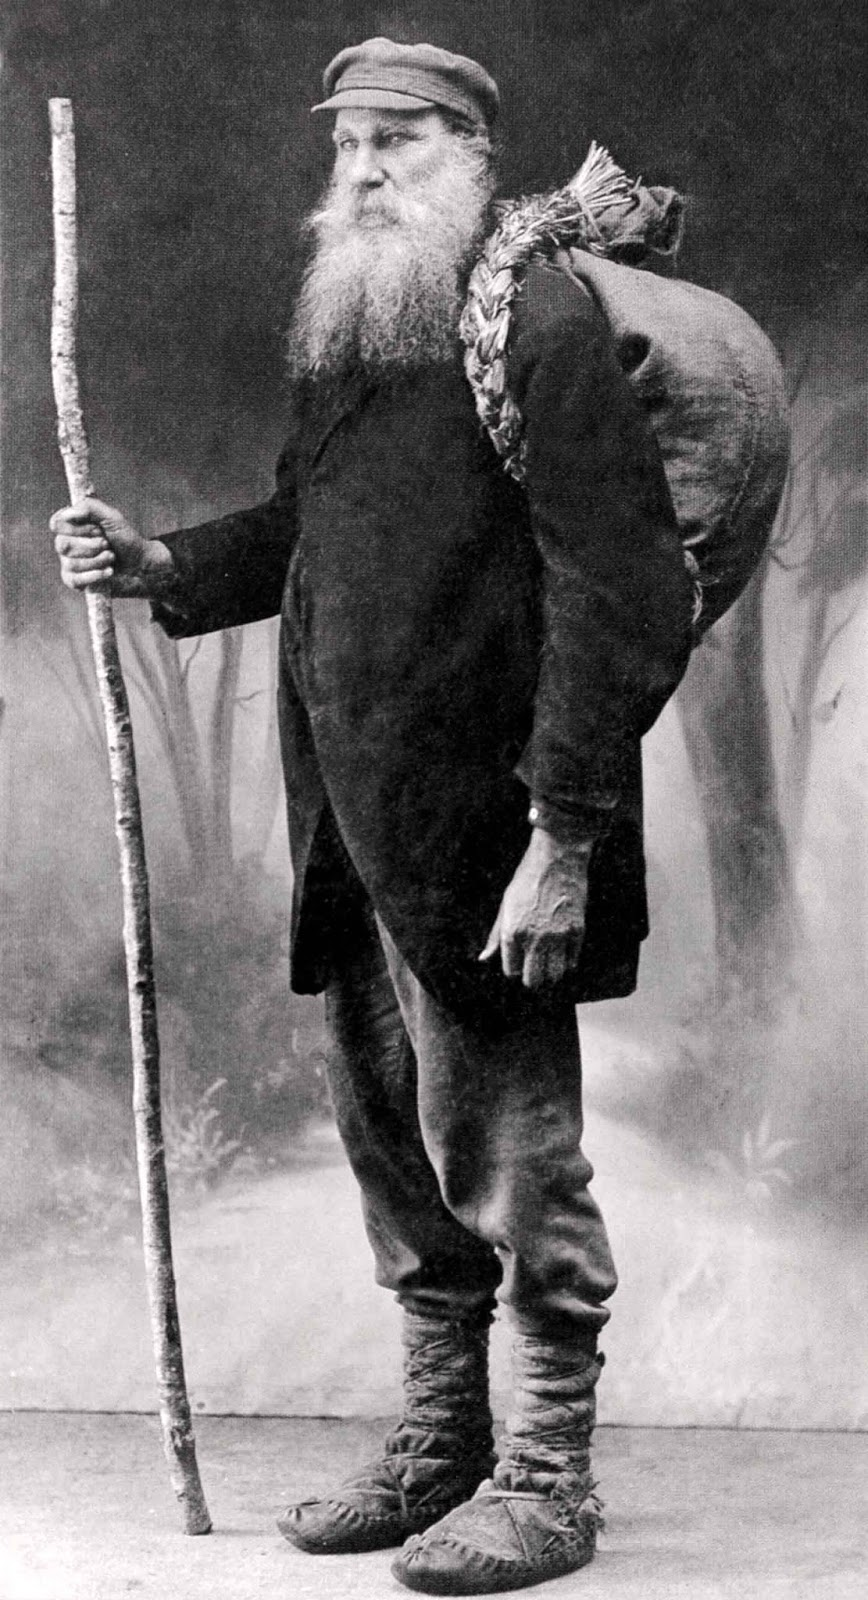 The famous book smuggler (knygnešys) Vincas Juska.